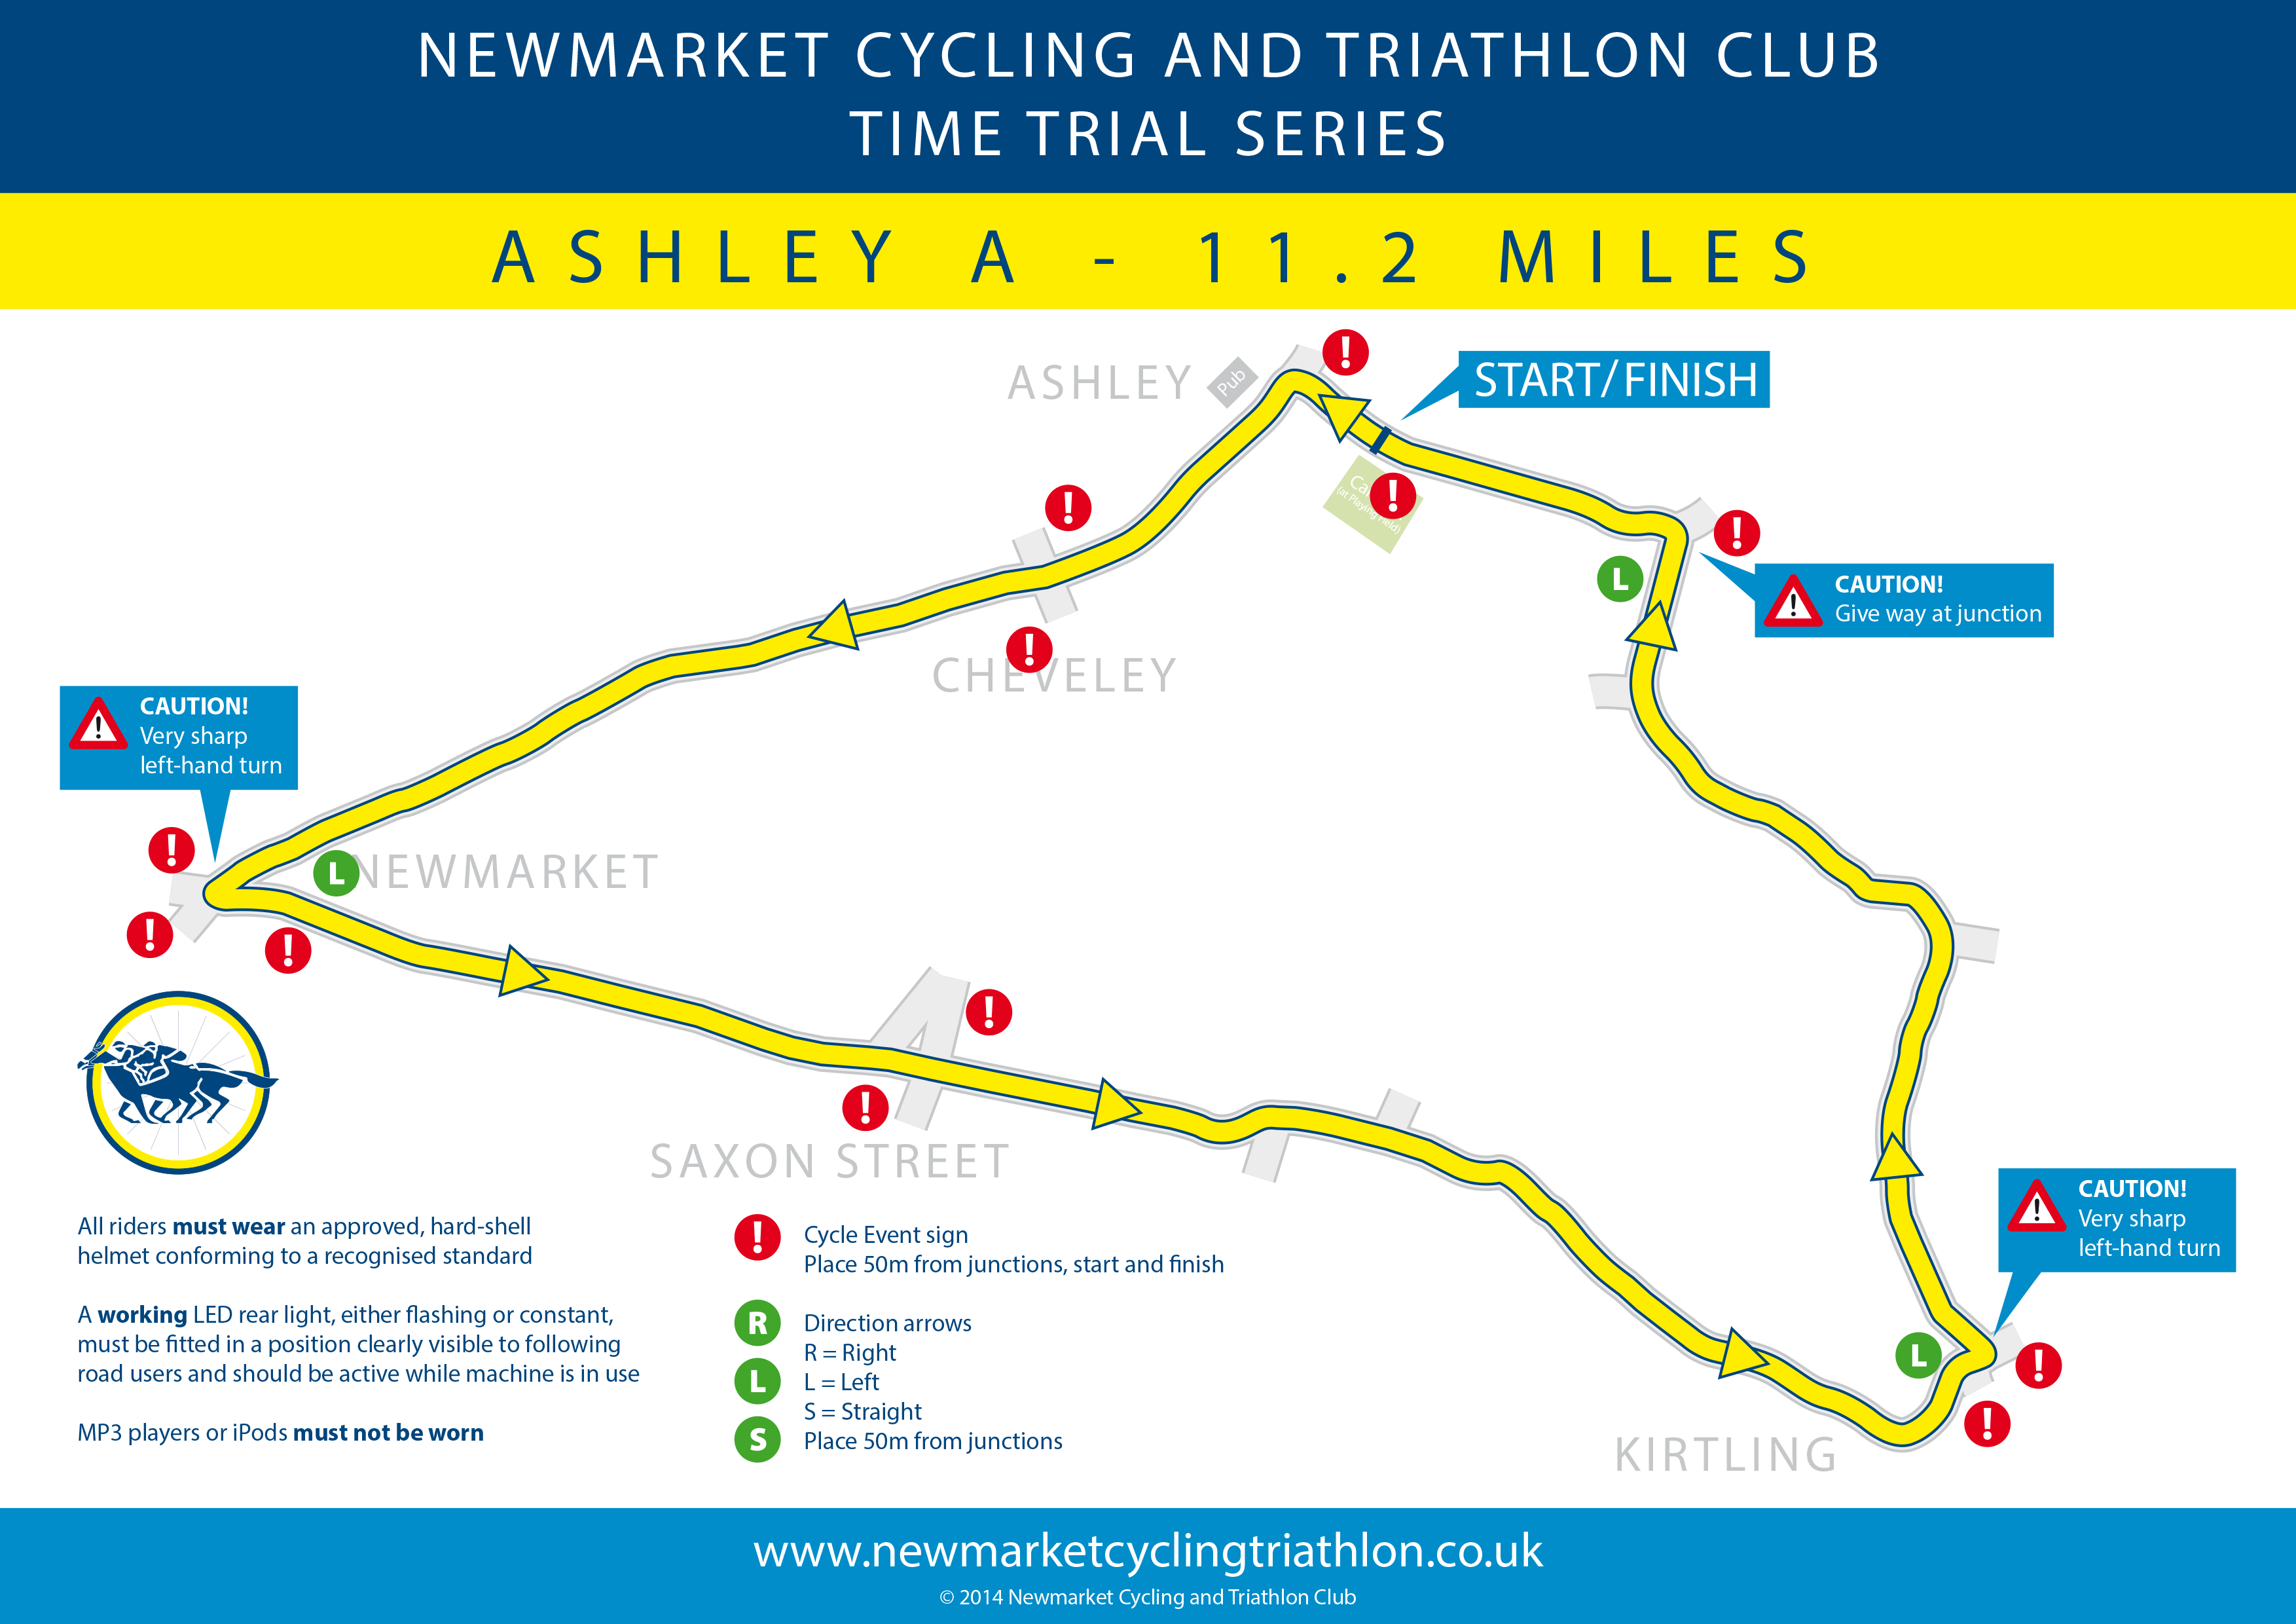 NCTC Ashley A TT route